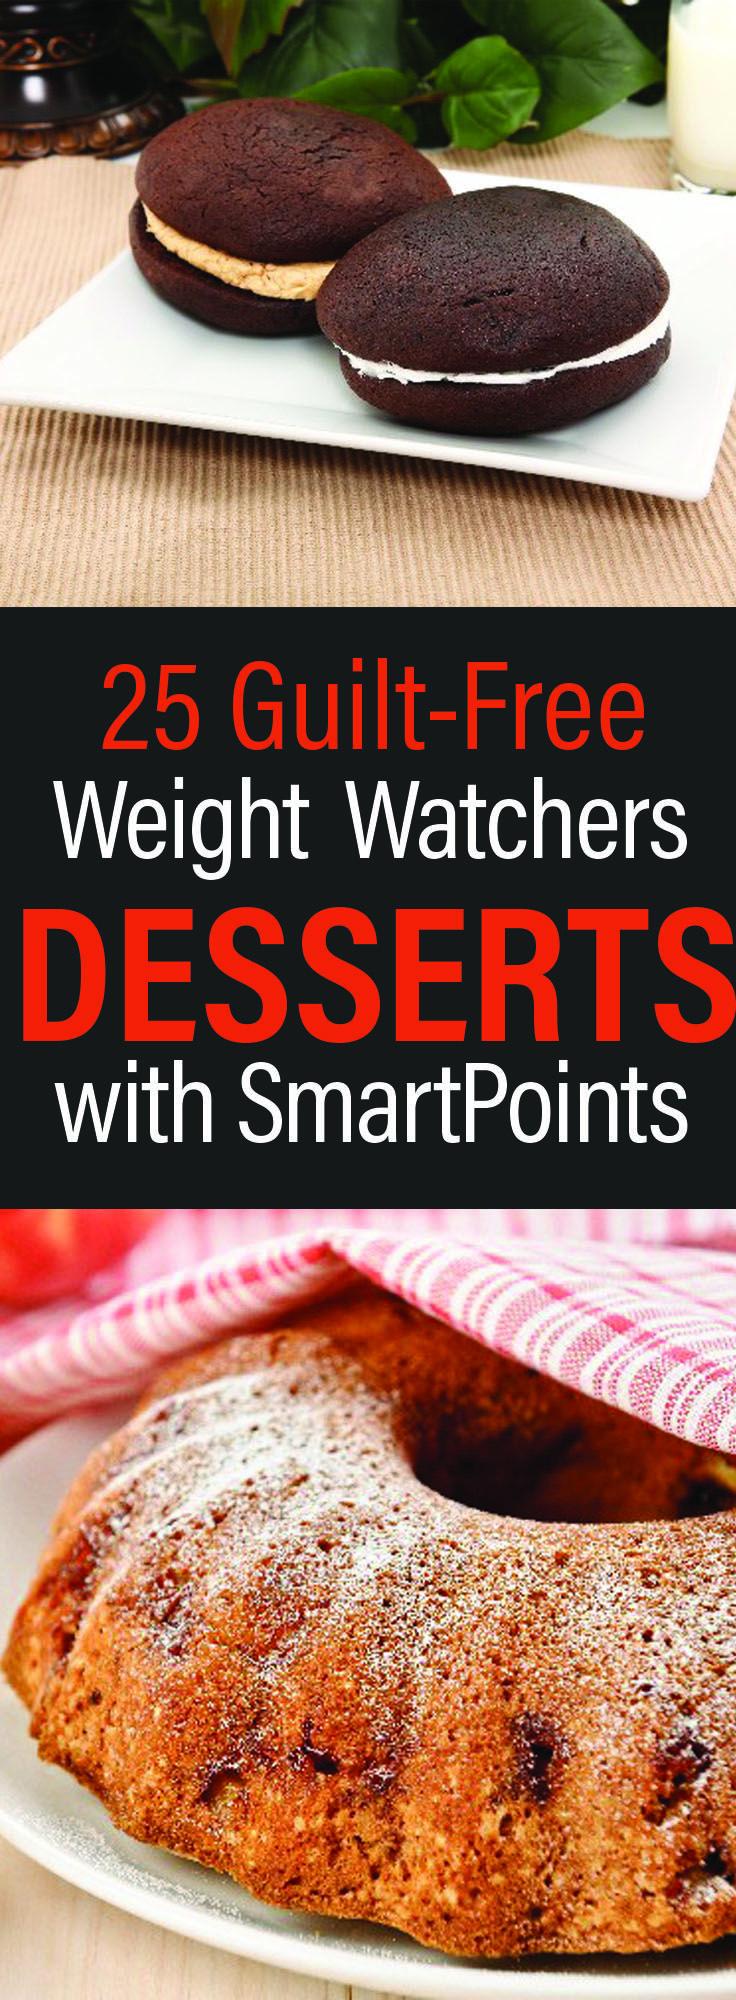 25 Guilt-Free Weight Watchers Desserts with SmartPoints